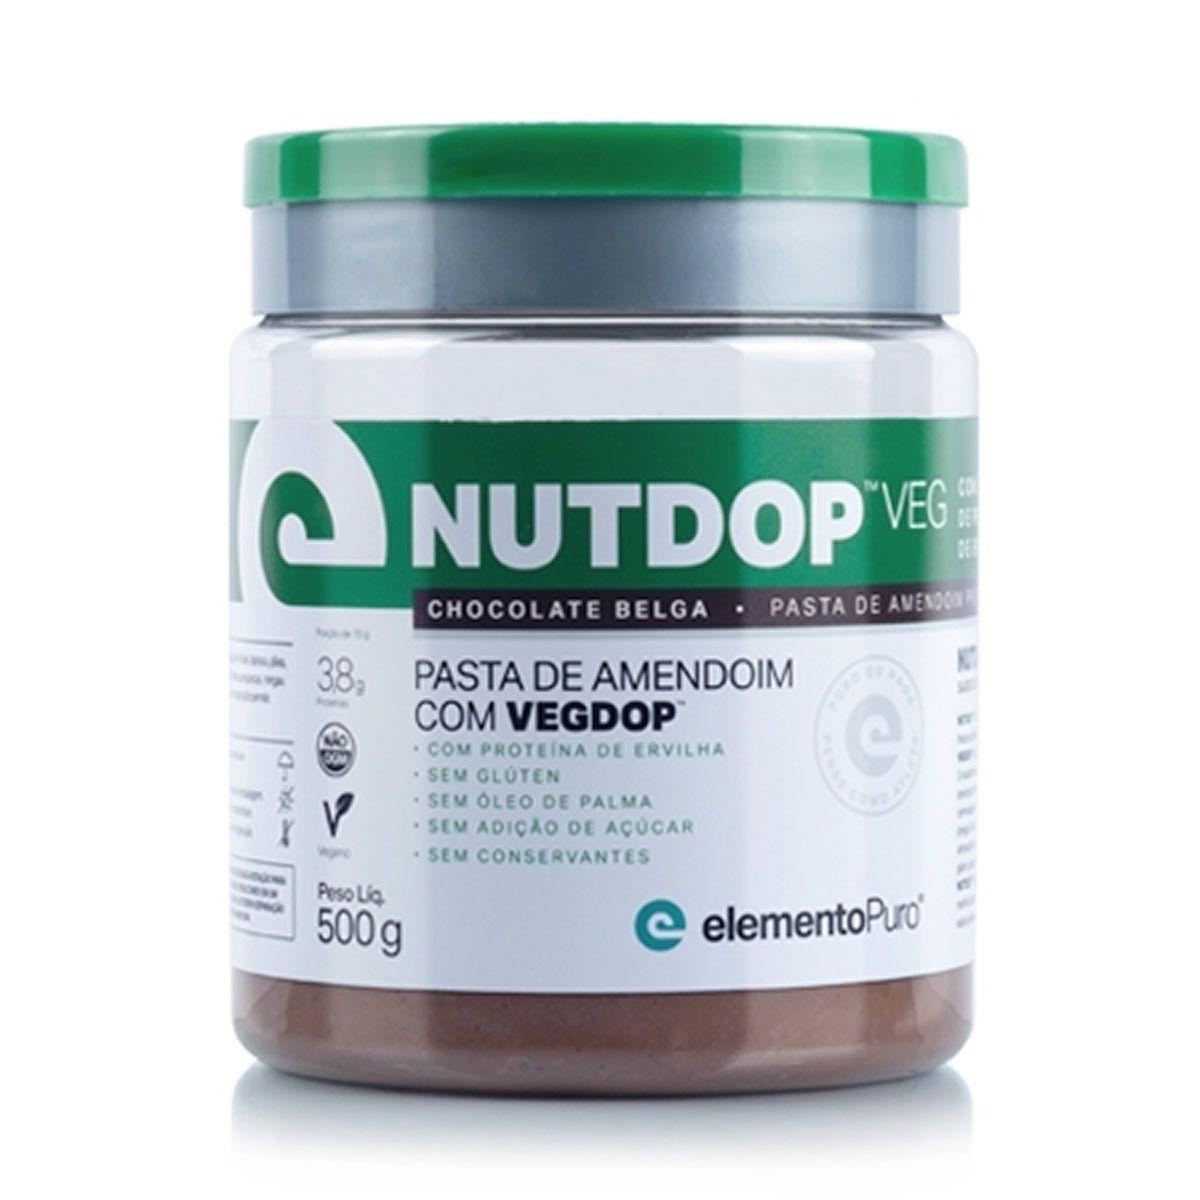 Nutdop Veg Chocolate Belga (500g) Elemento Puro